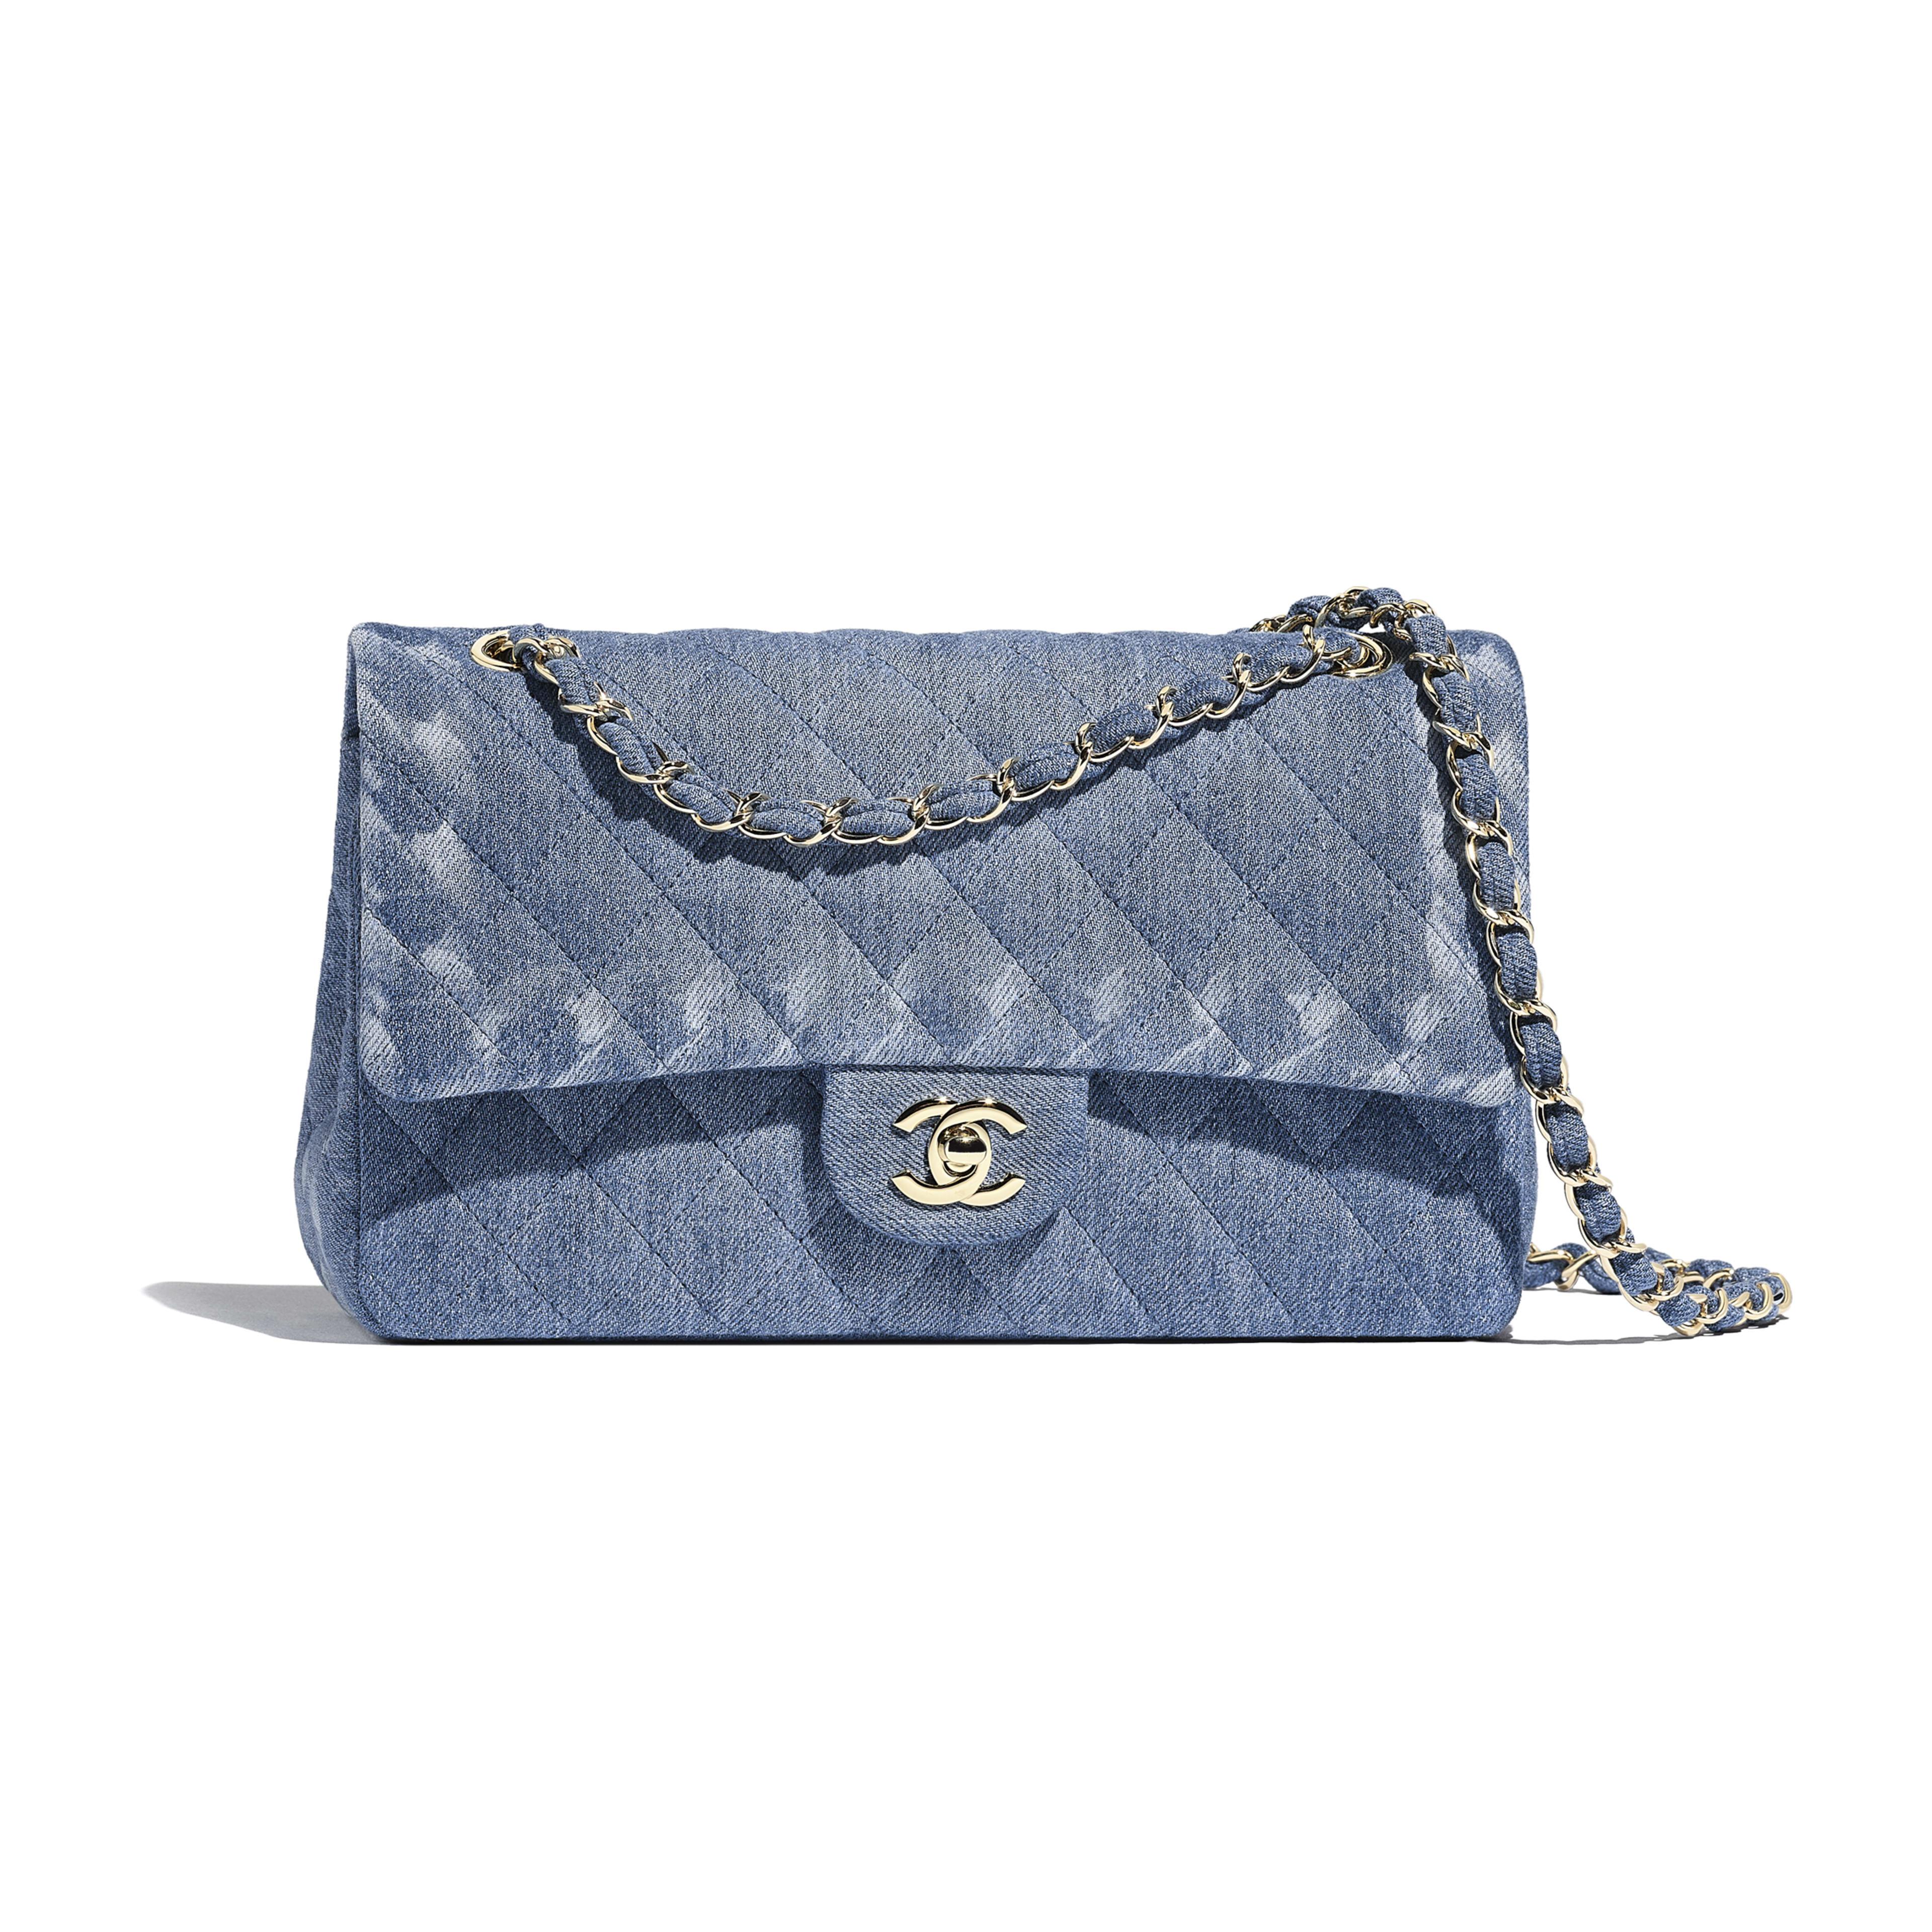 45b7134f8f Denim   Gold-Tone Metal Blue Classic Handbag